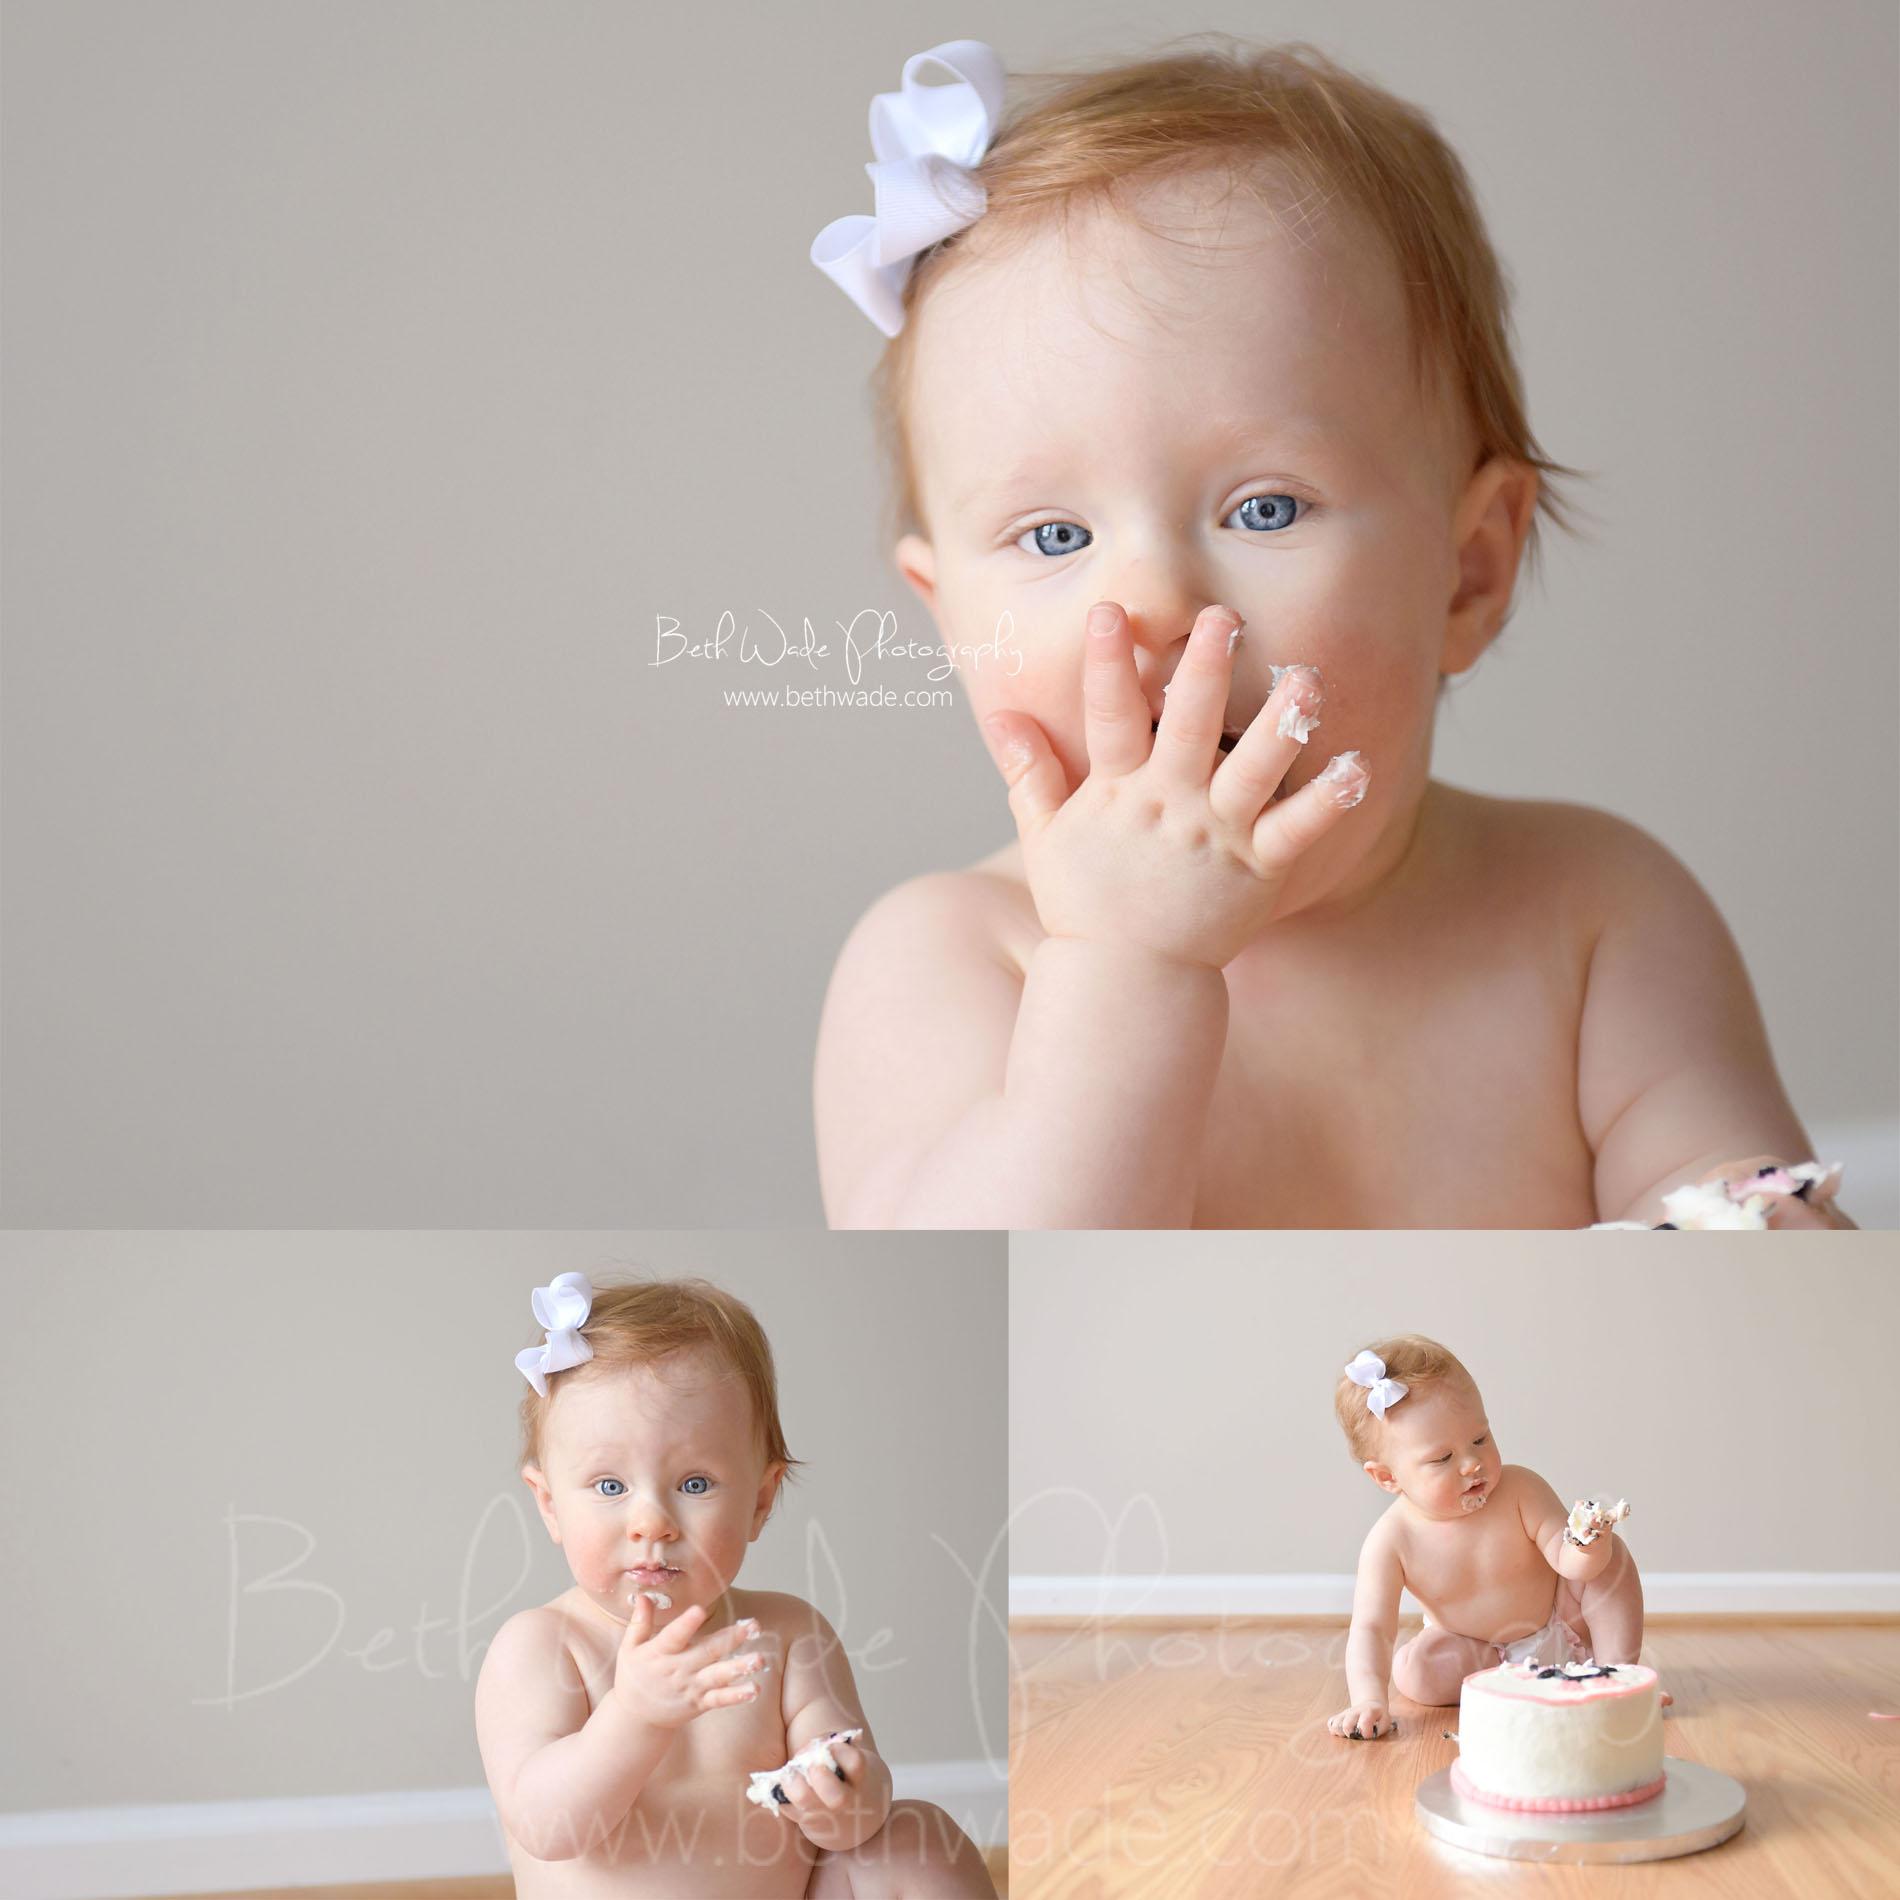 first birthday cake smash 1 year old baby girl - charlotte baby photographer